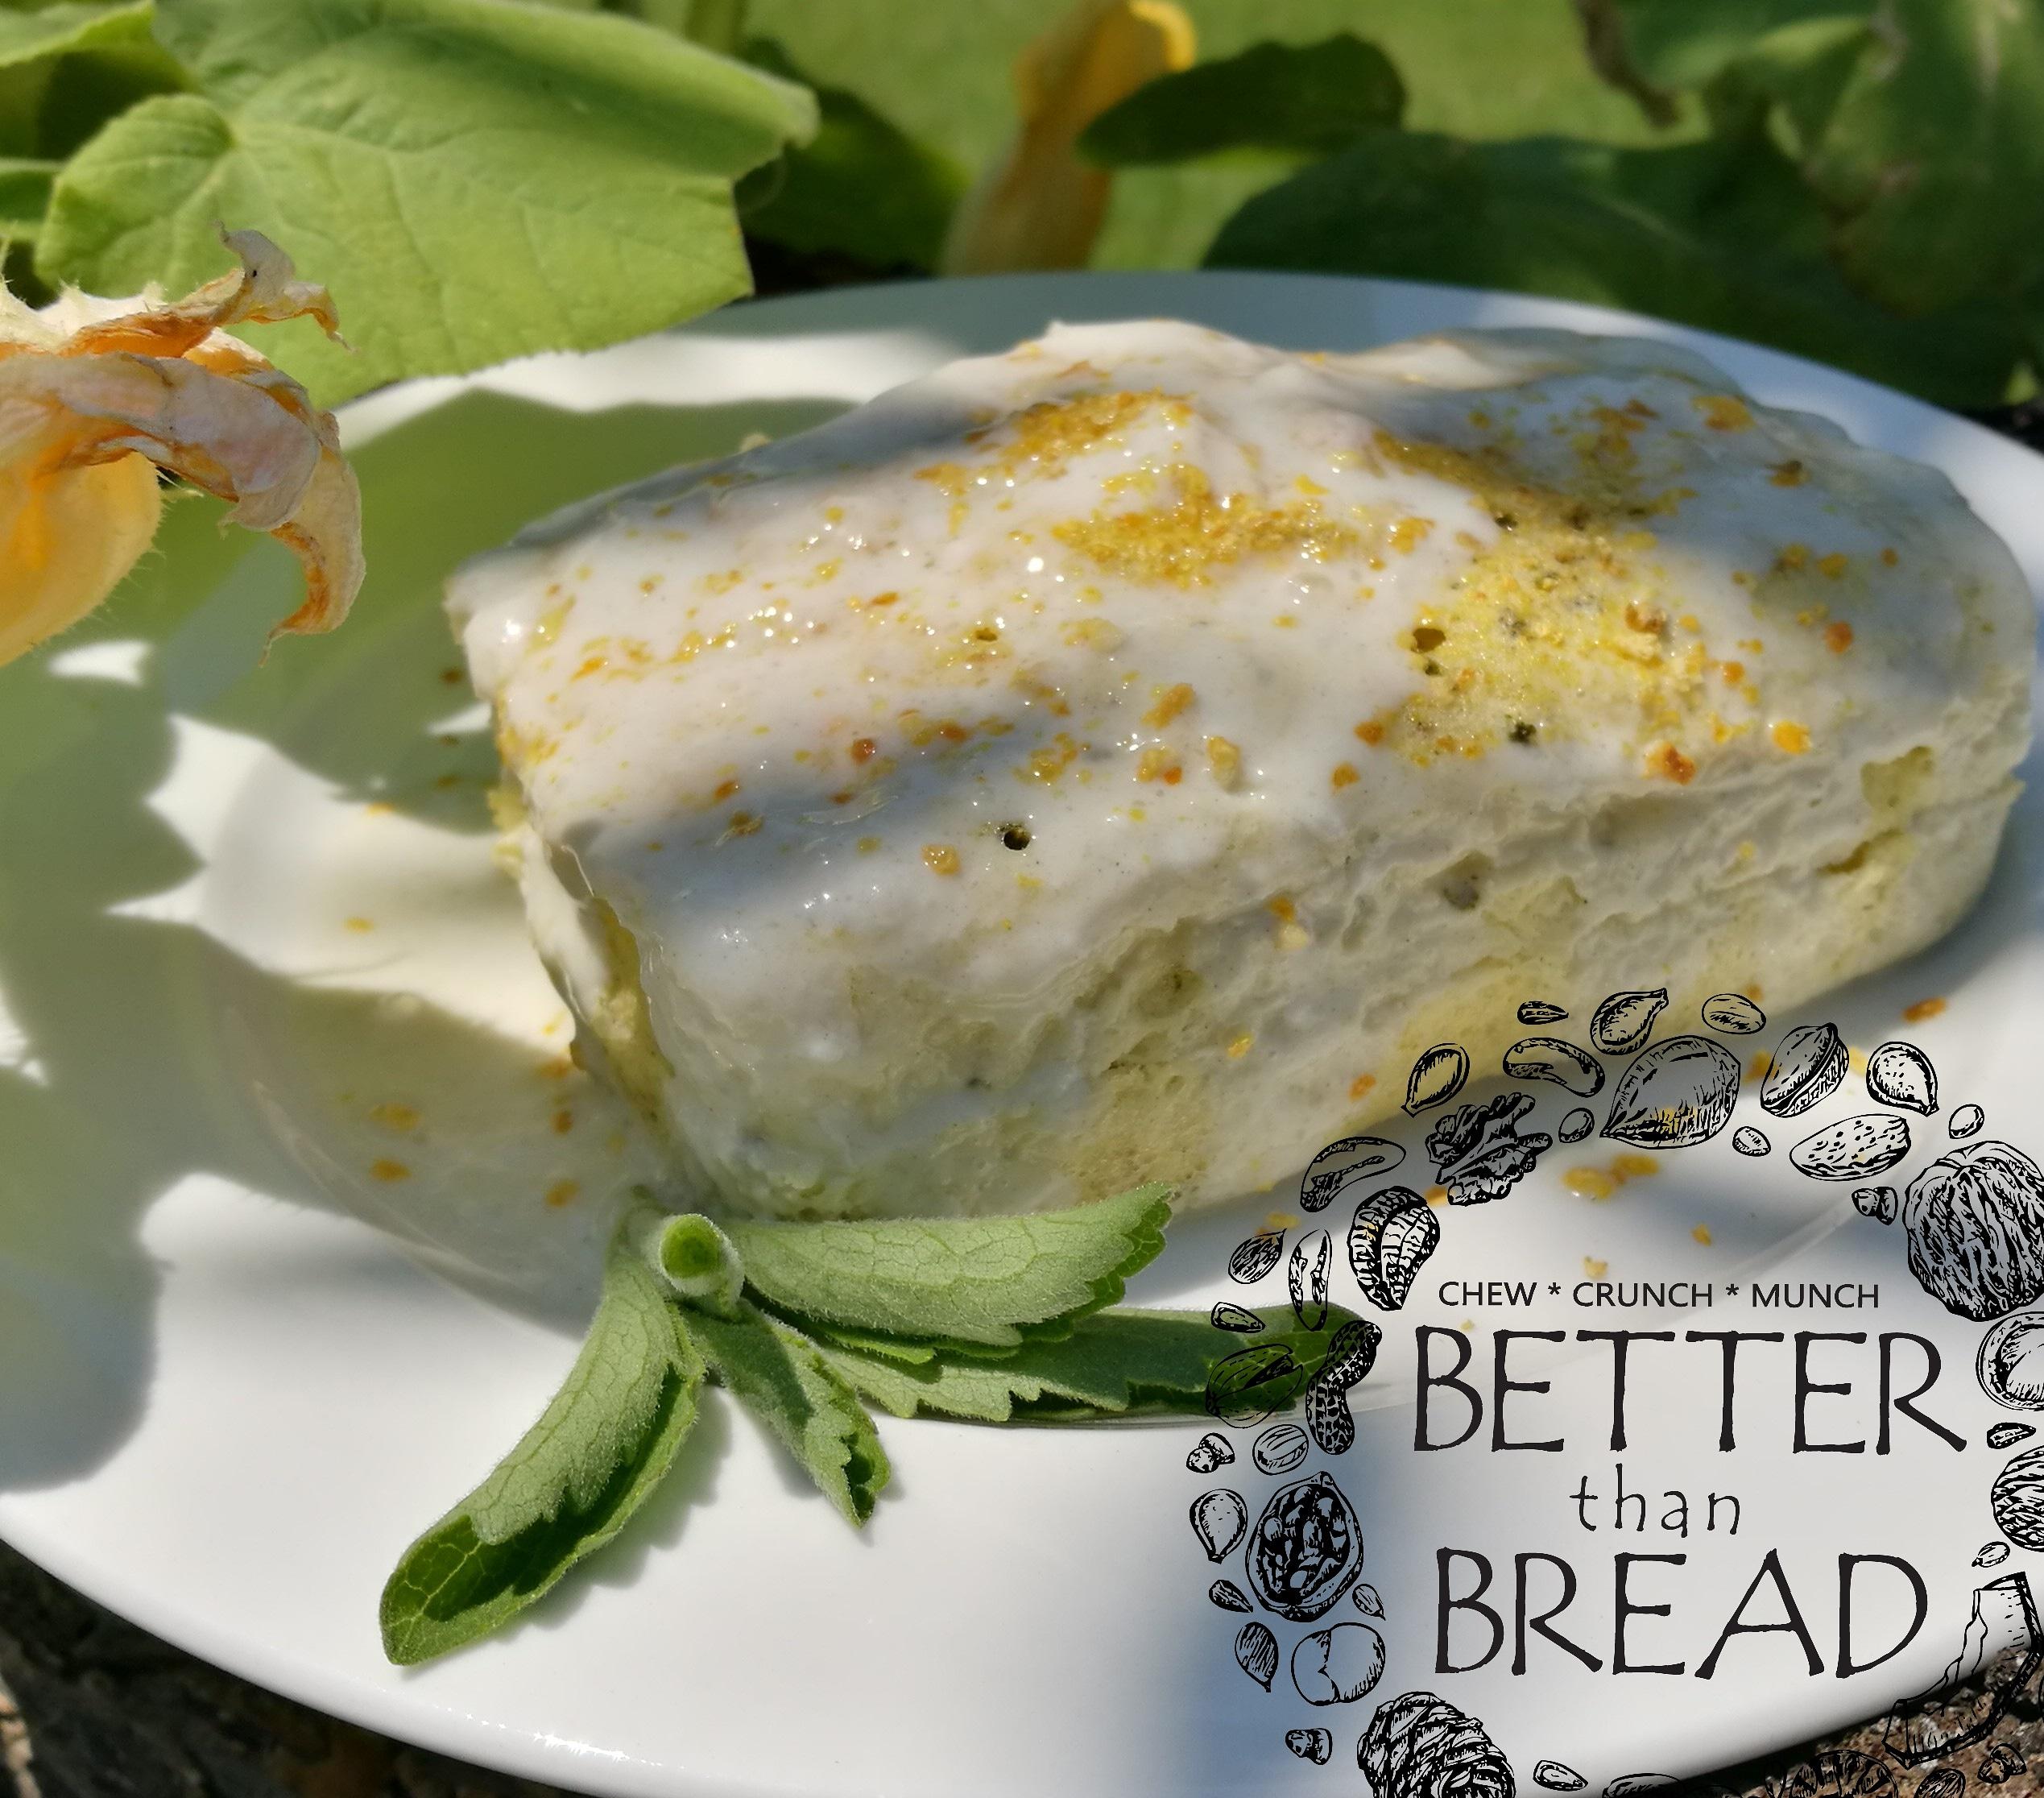 Better Than Bread Lemon Cake, garnished with stevia leaves.